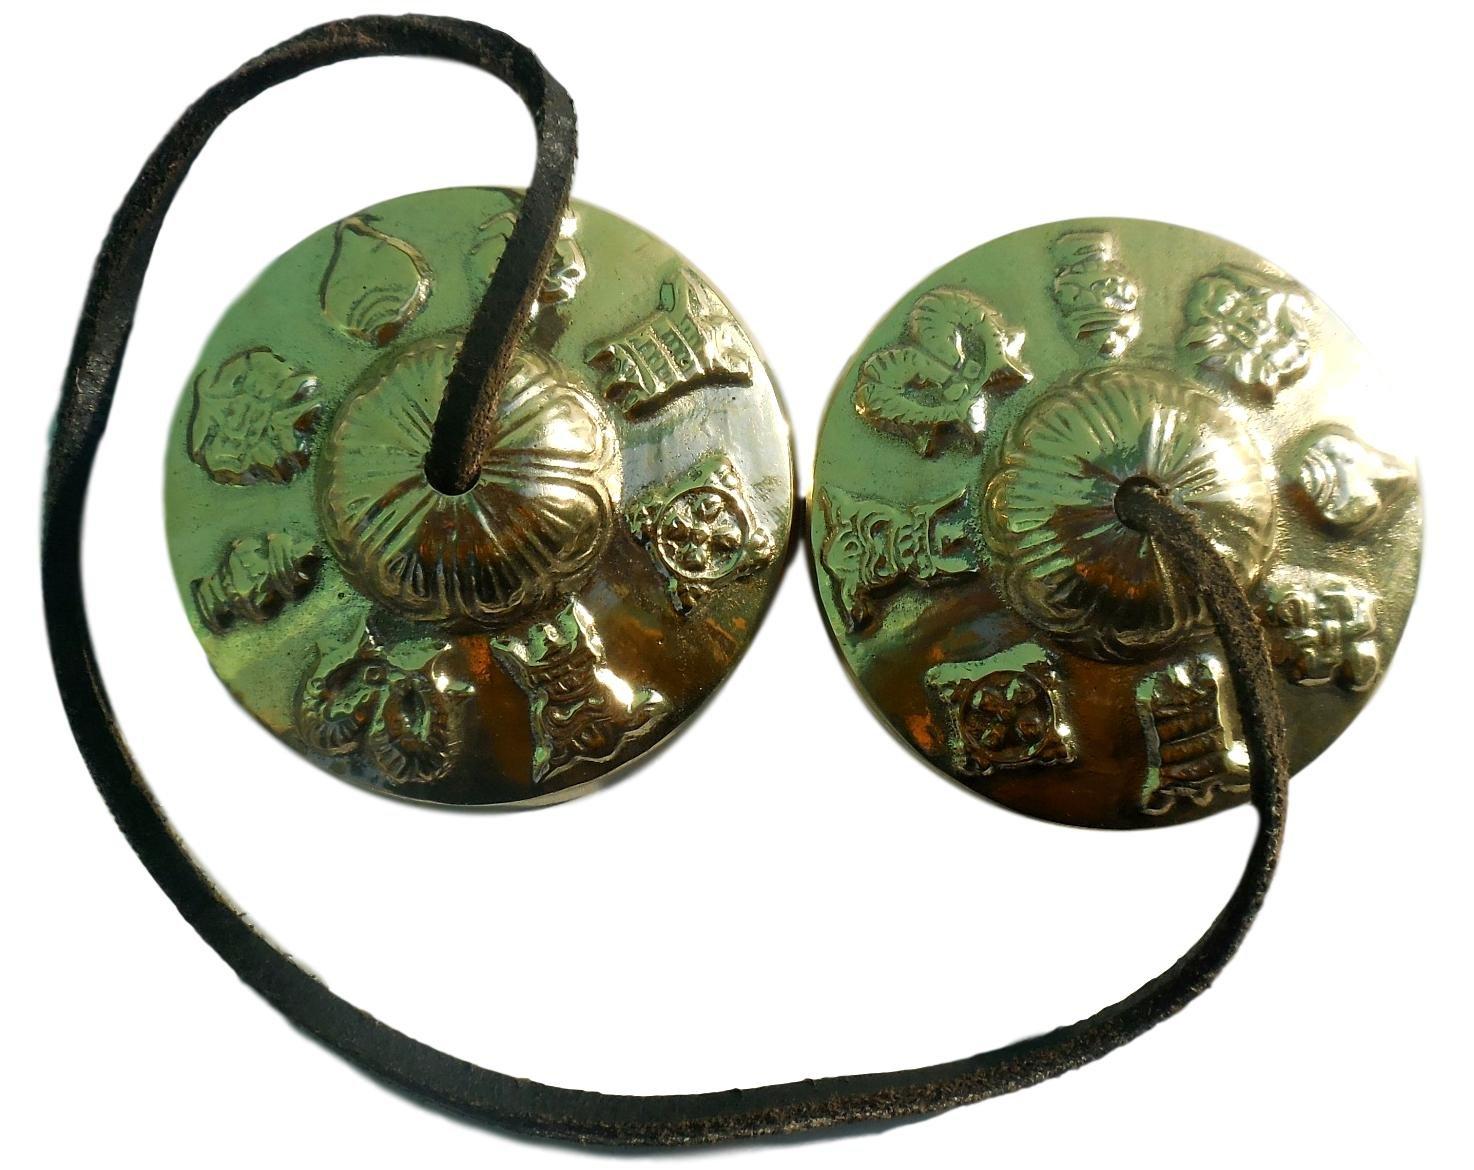 Hand Tuned to Key of Om 2.25 Inch- Tingsha Tibetan Bell (Chimes) Buddhist Lucky Symbols (Medium) Thamelmart tha-0131